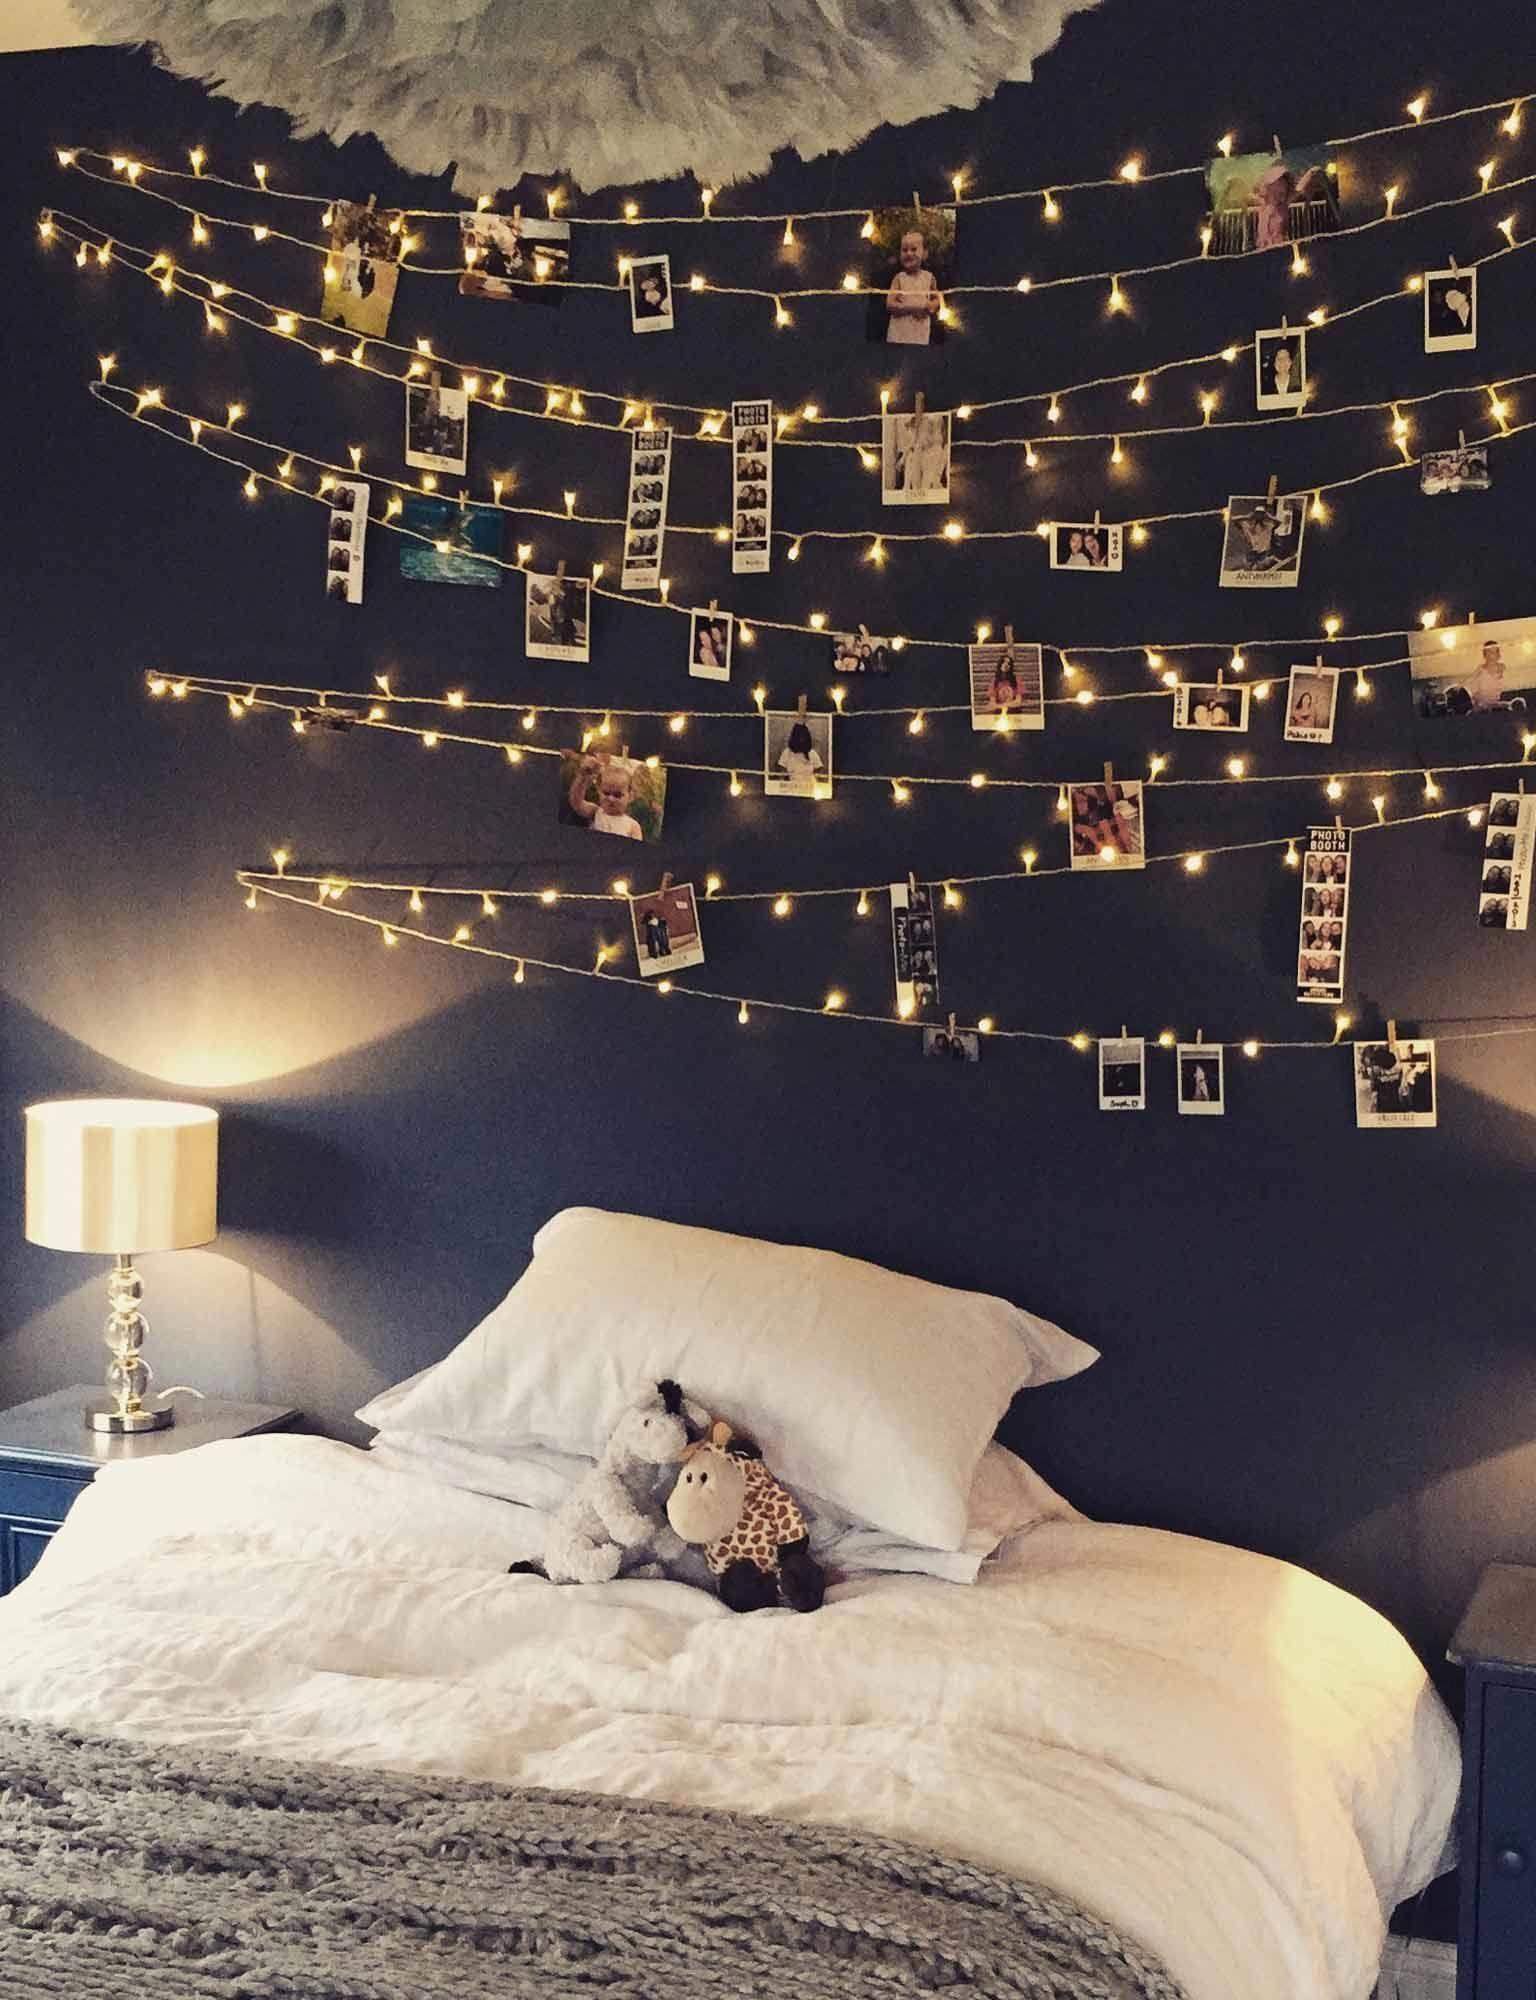 Diy Bedroom Fairy Light Wall Bedroomideasforsmallrooms